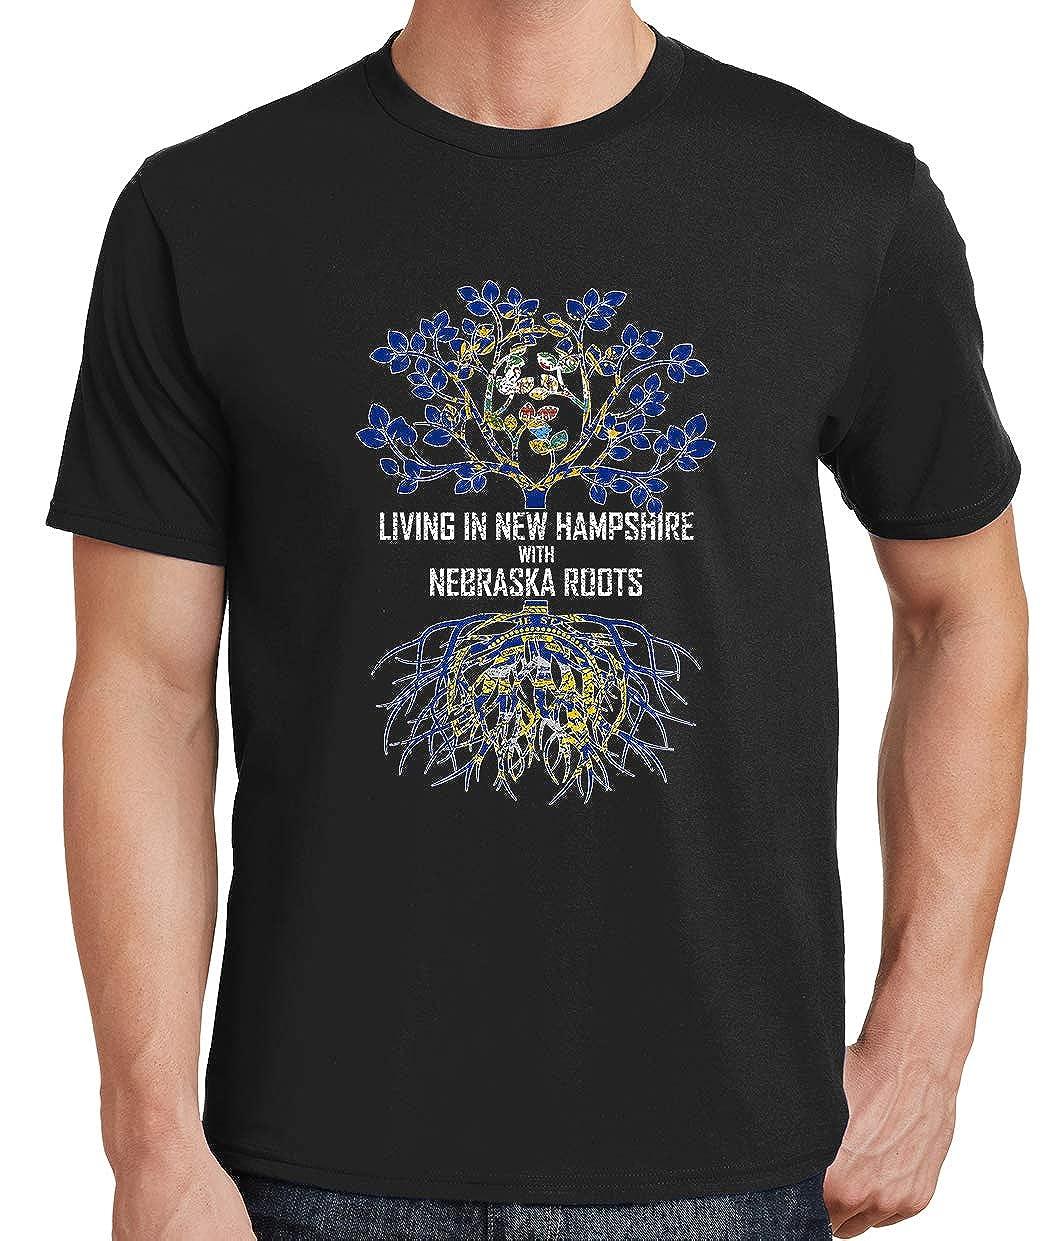 Tenacitee Mens Living in Hampshire Nebraska Roots T-Shirt